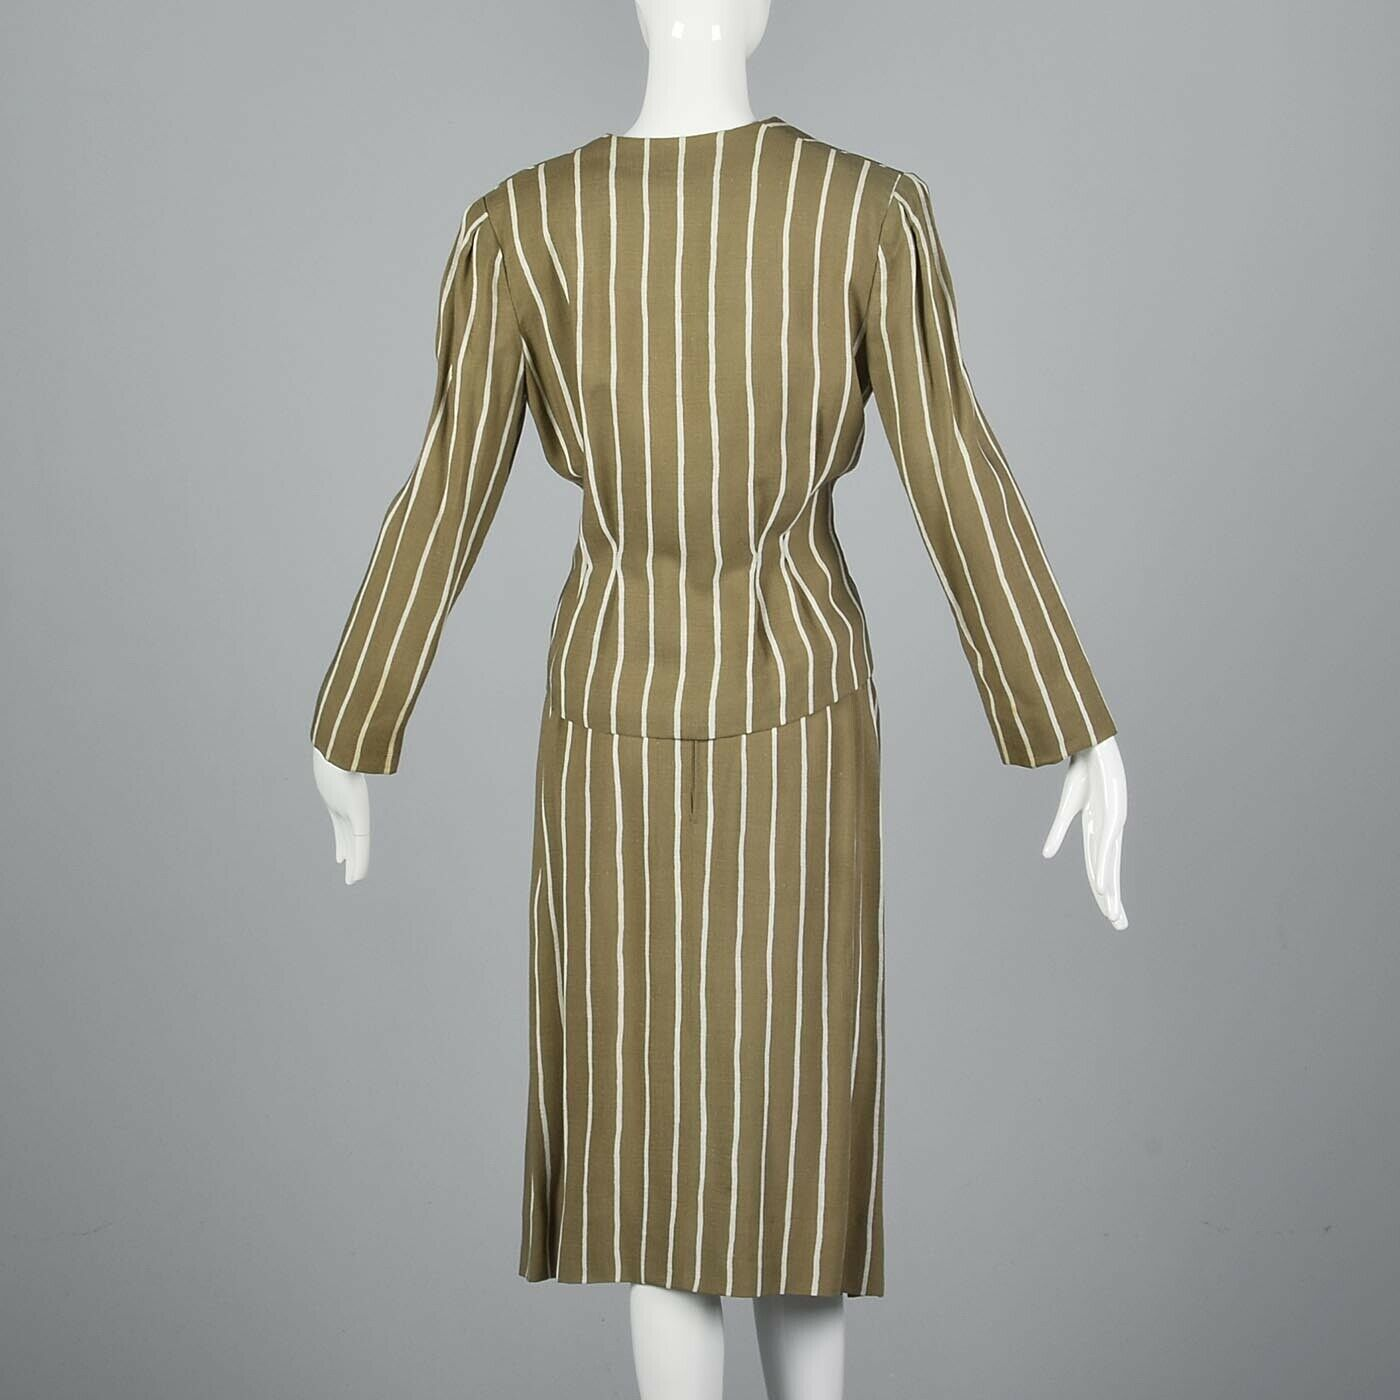 L Vintage 1980s 80s Pauline Trigere Striped Skirt… - image 3